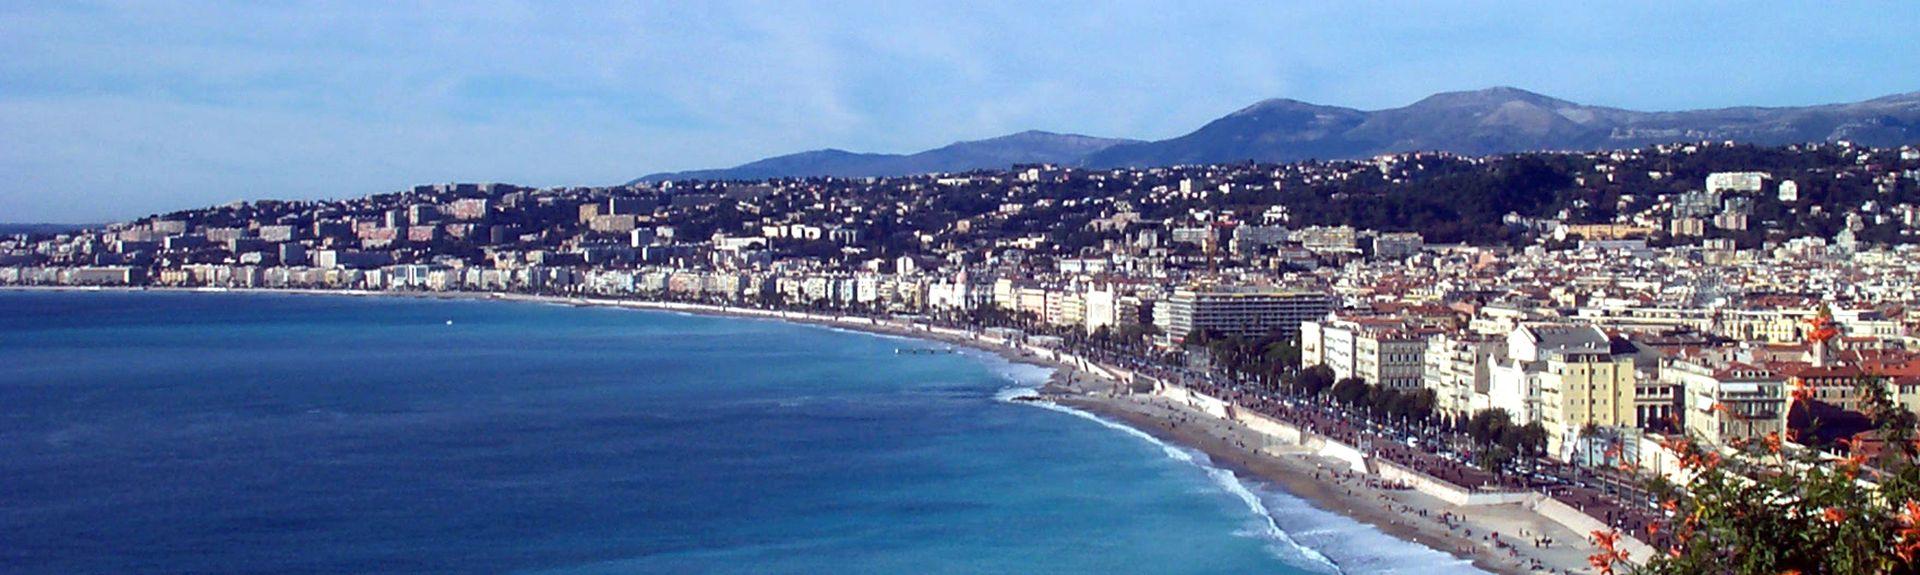 Ventabrun, Nice, France